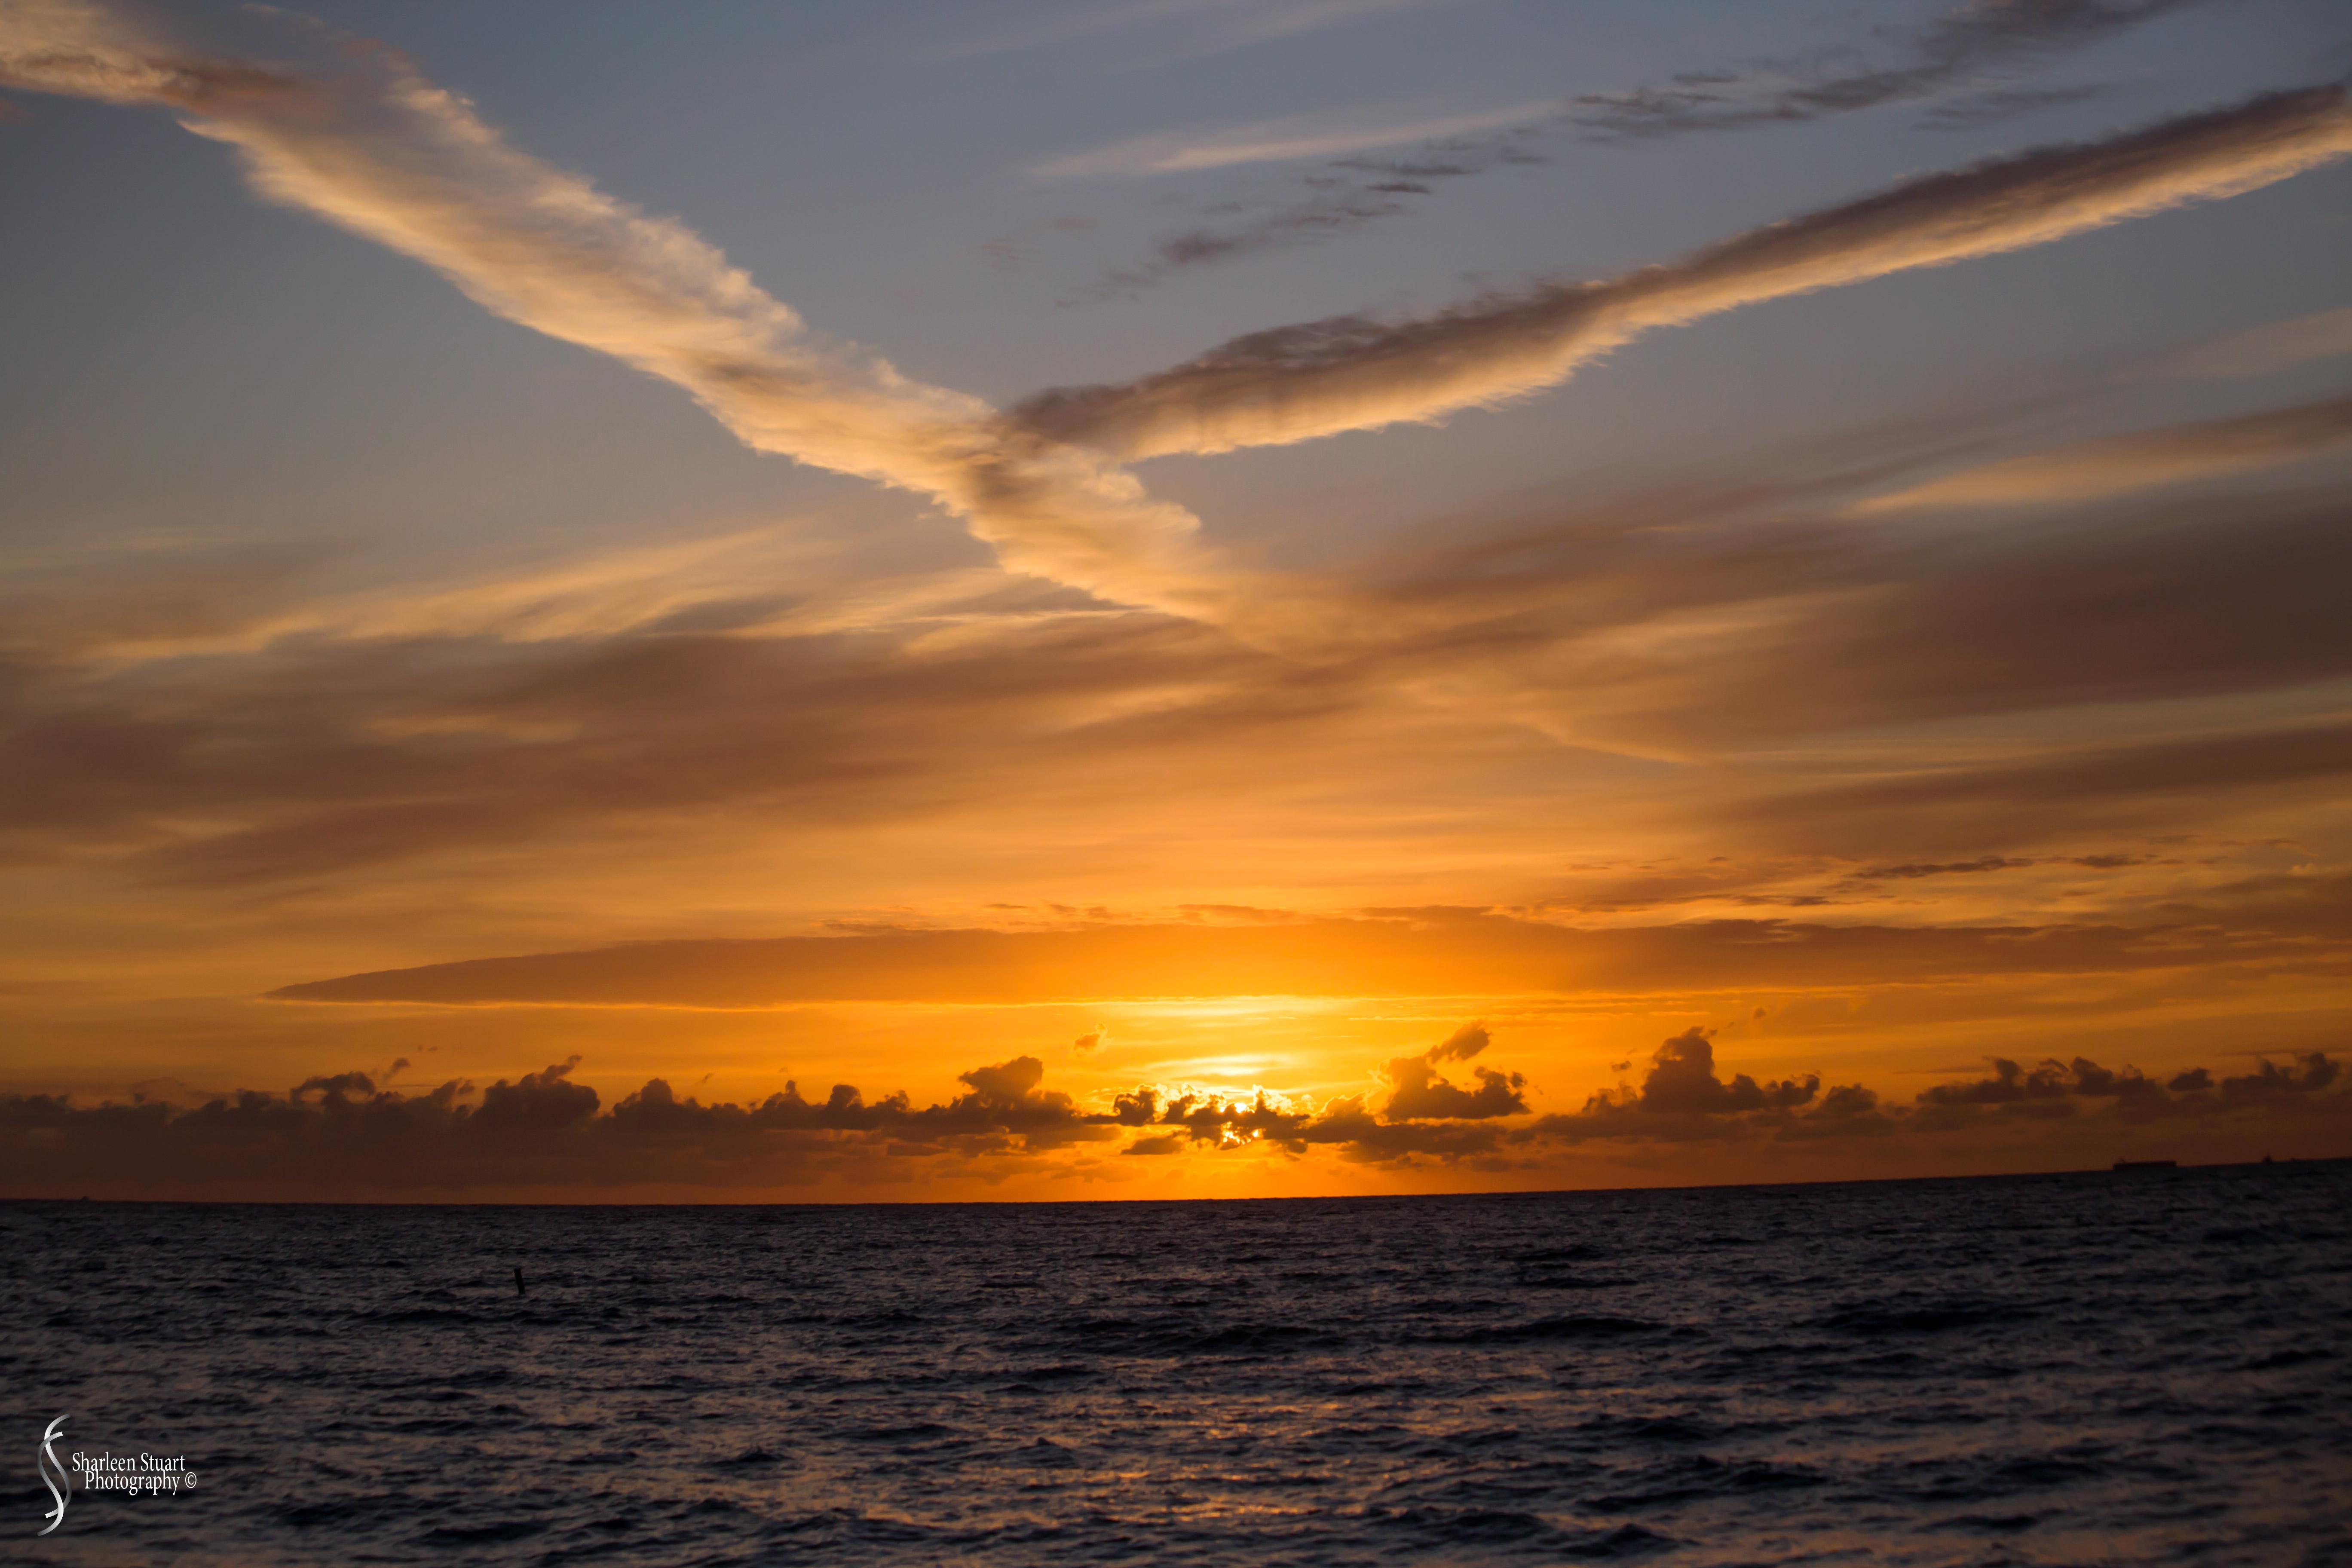 Deerfield Beach: Day before Hurricane Dorian: Nov 24, 2019: 8390